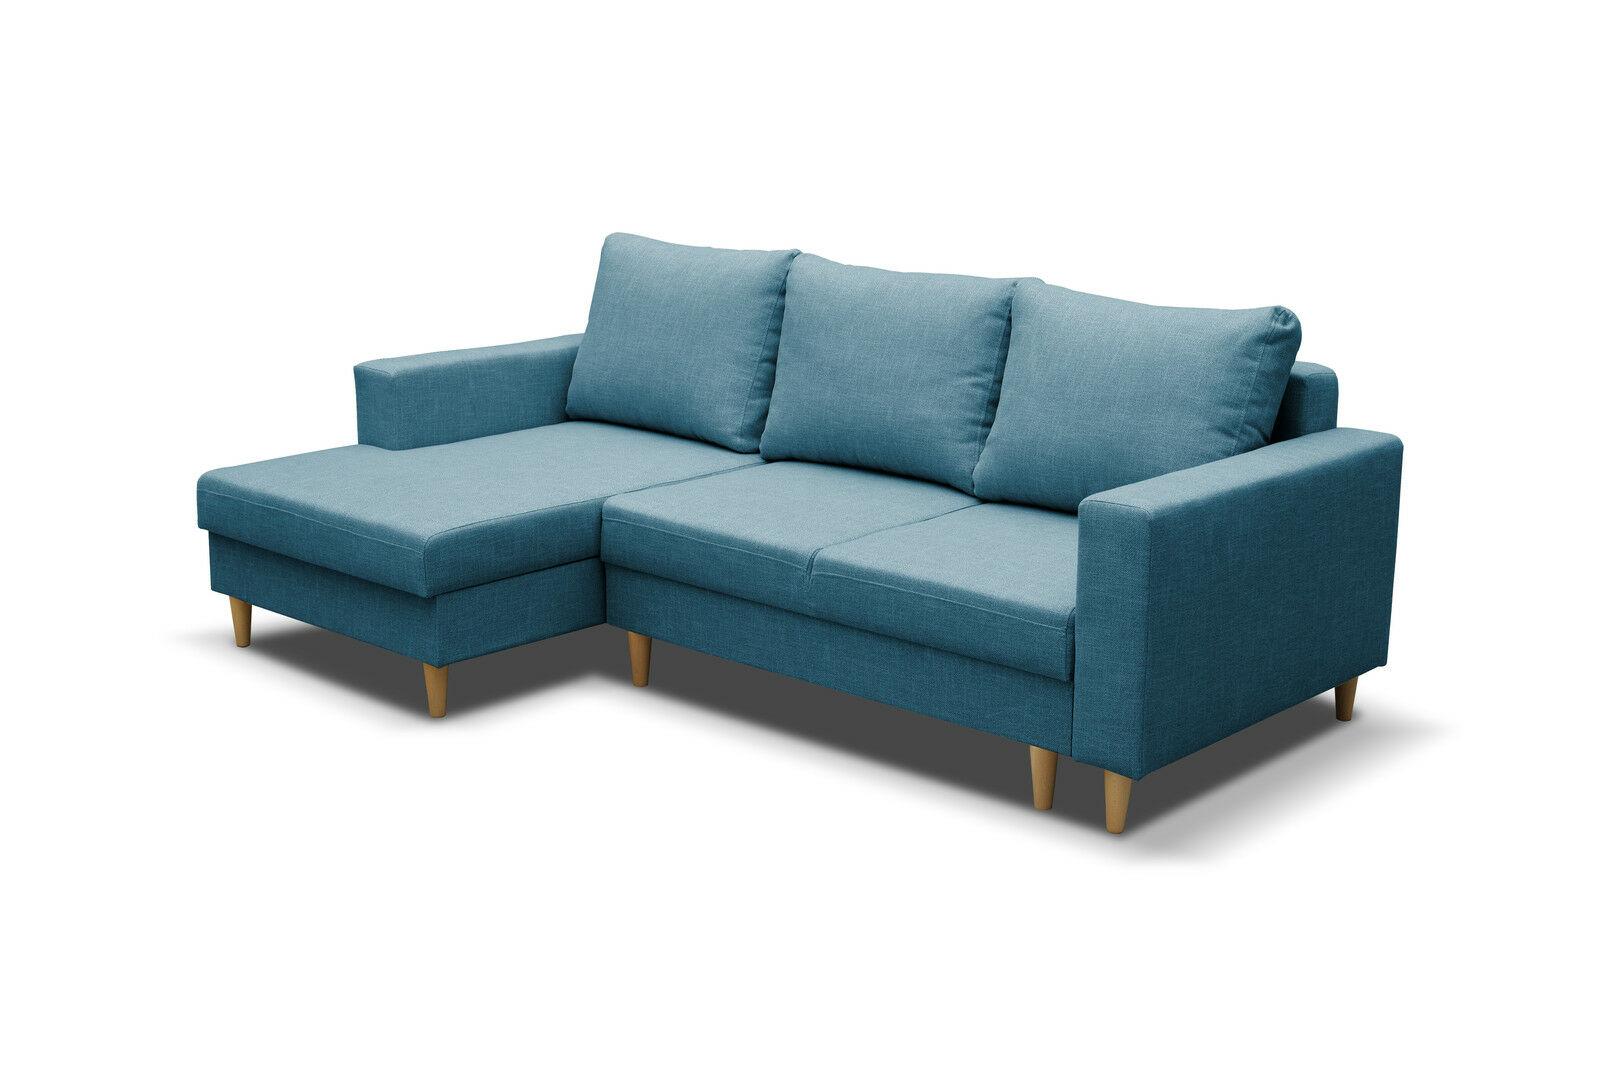 Couchgarnitur Vito Lme Sofa Polsterecke Couch Polstergarnitur